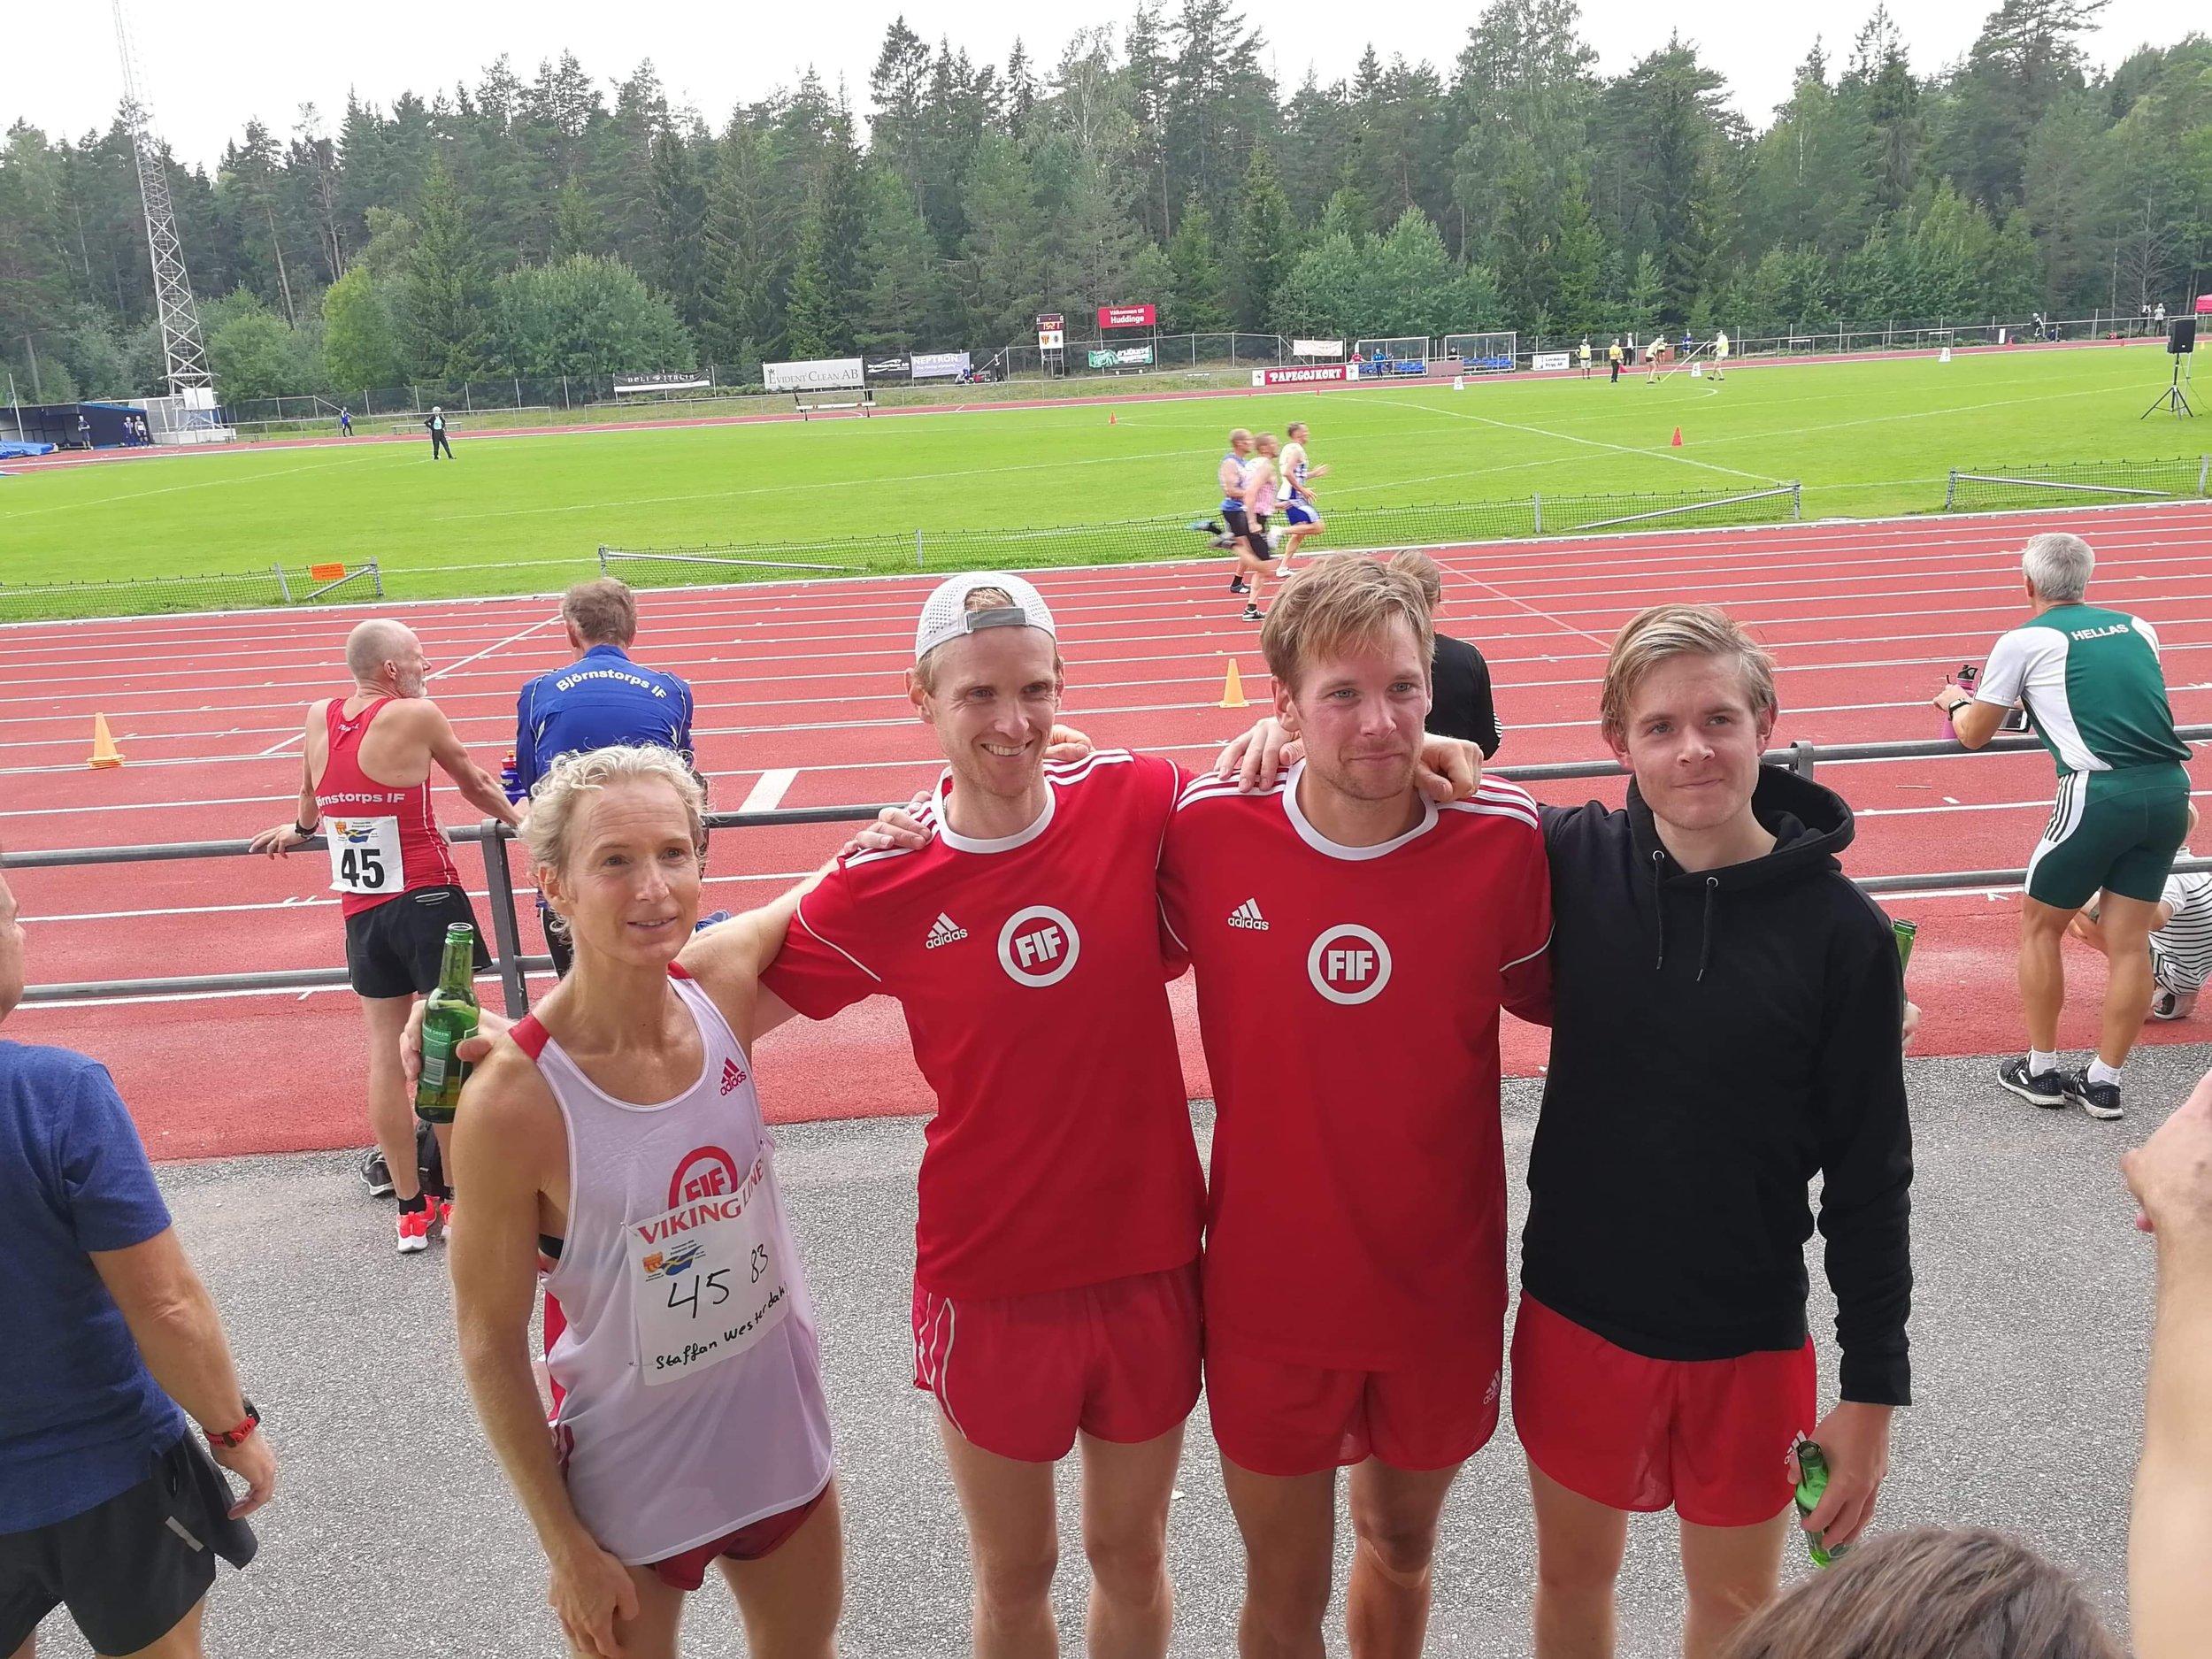 Staffan Westerdahl, Fredrik Westerdahl, Henrik Engström och Oskar Lundahl efter 10 000m.